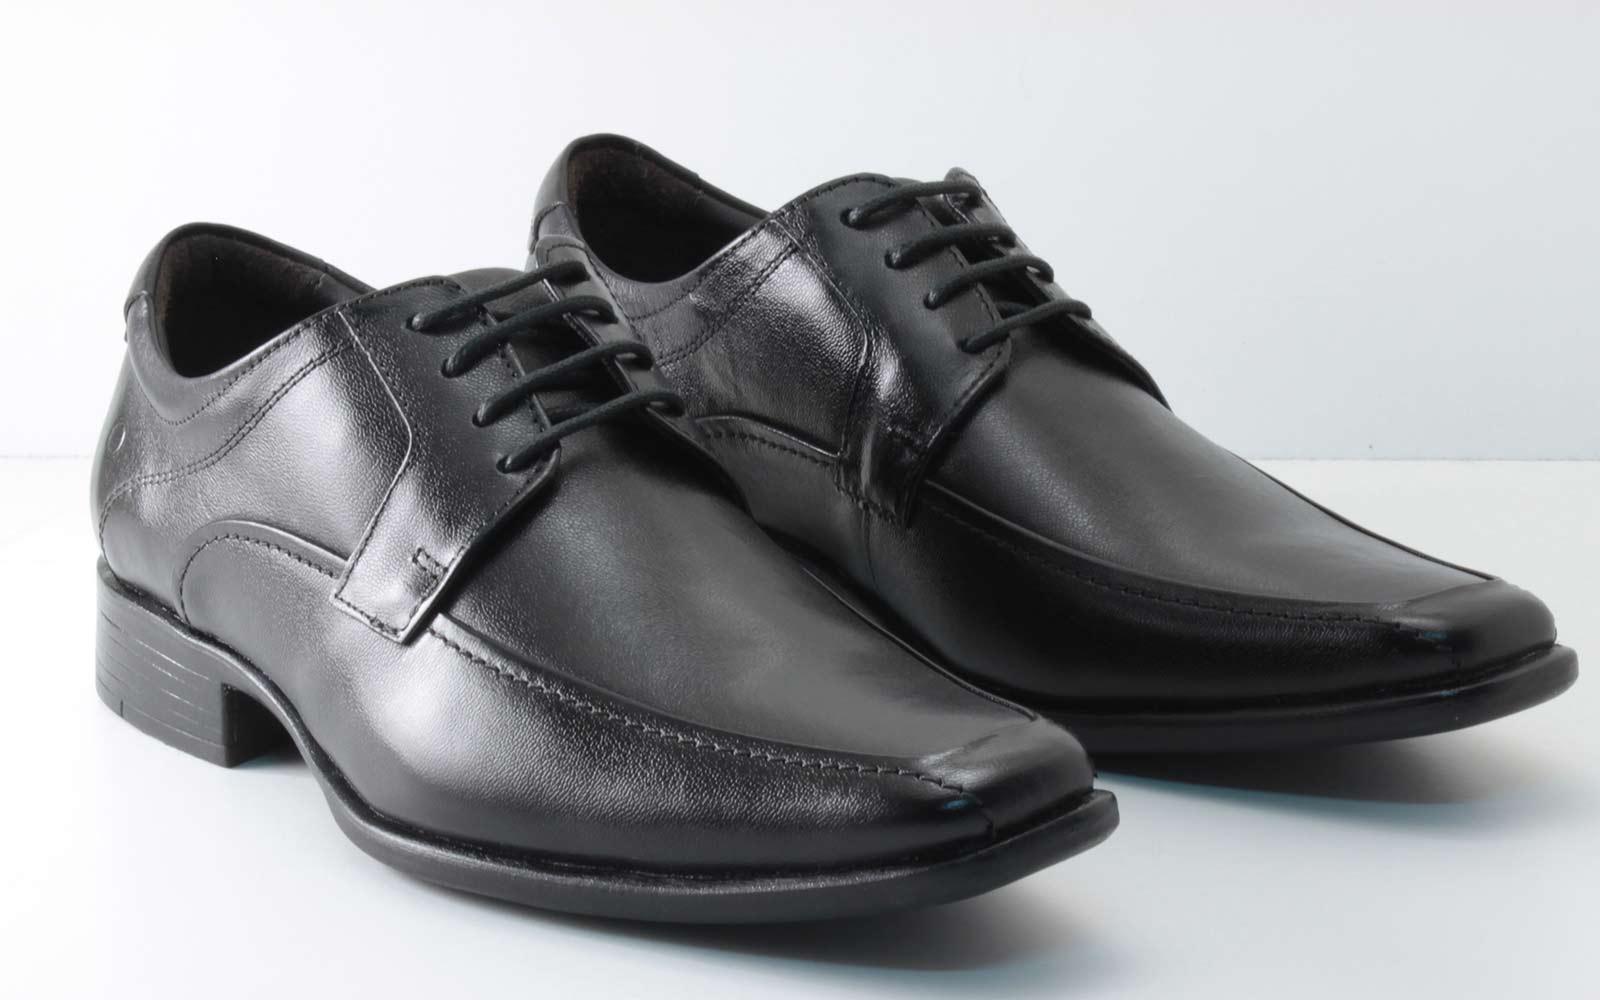 Sapato Social Democrata Hampton Cadarço Masculino 430025  - Ian Calçados